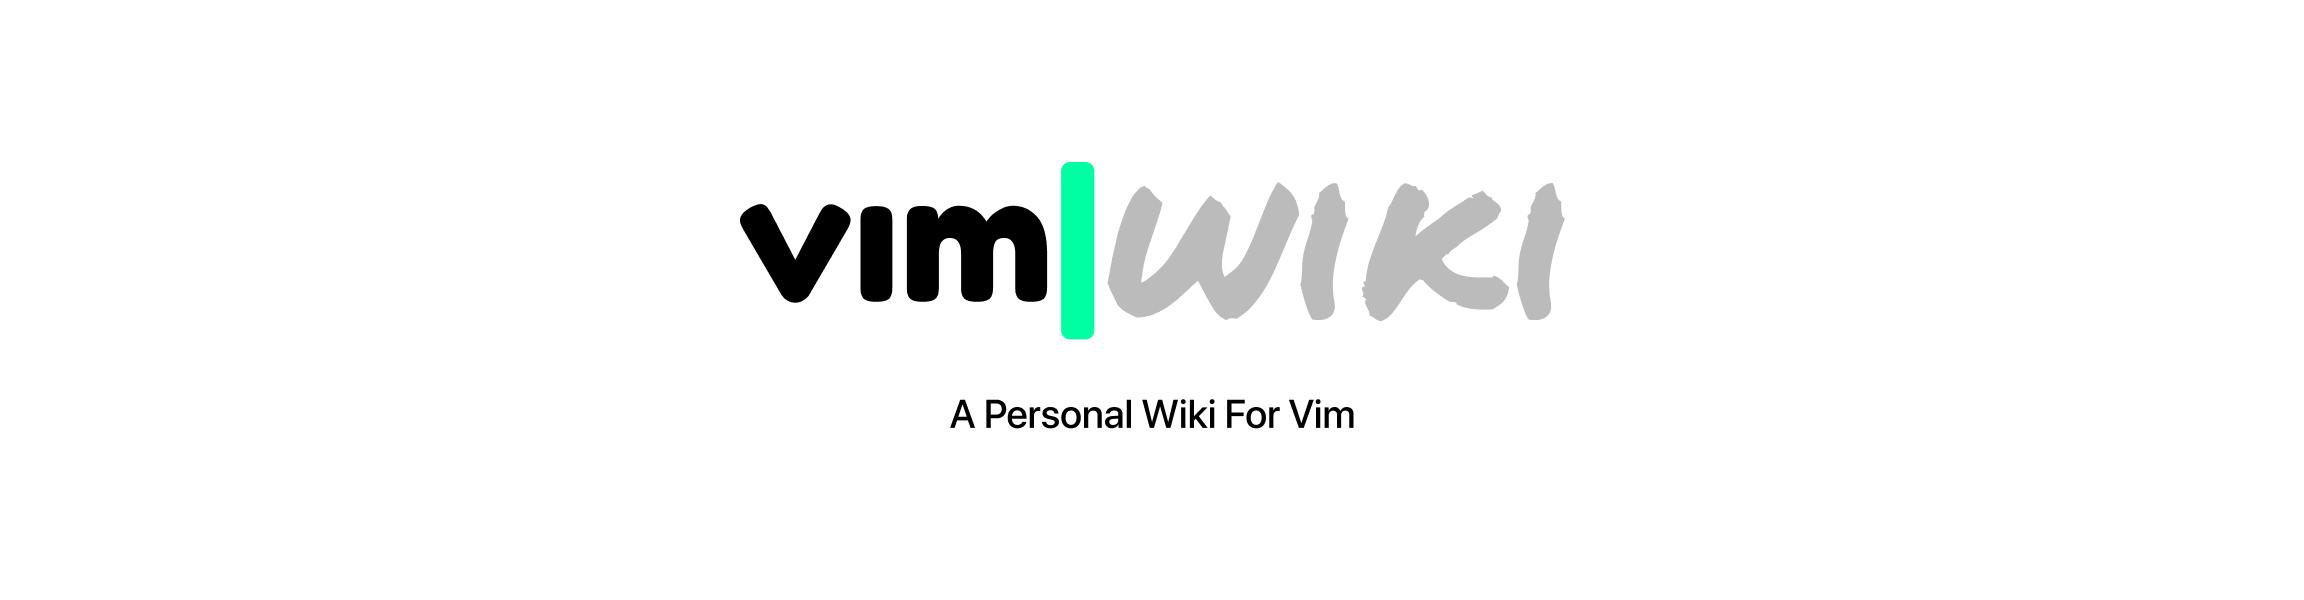 VimWiki: A Personal Wiki For Vim